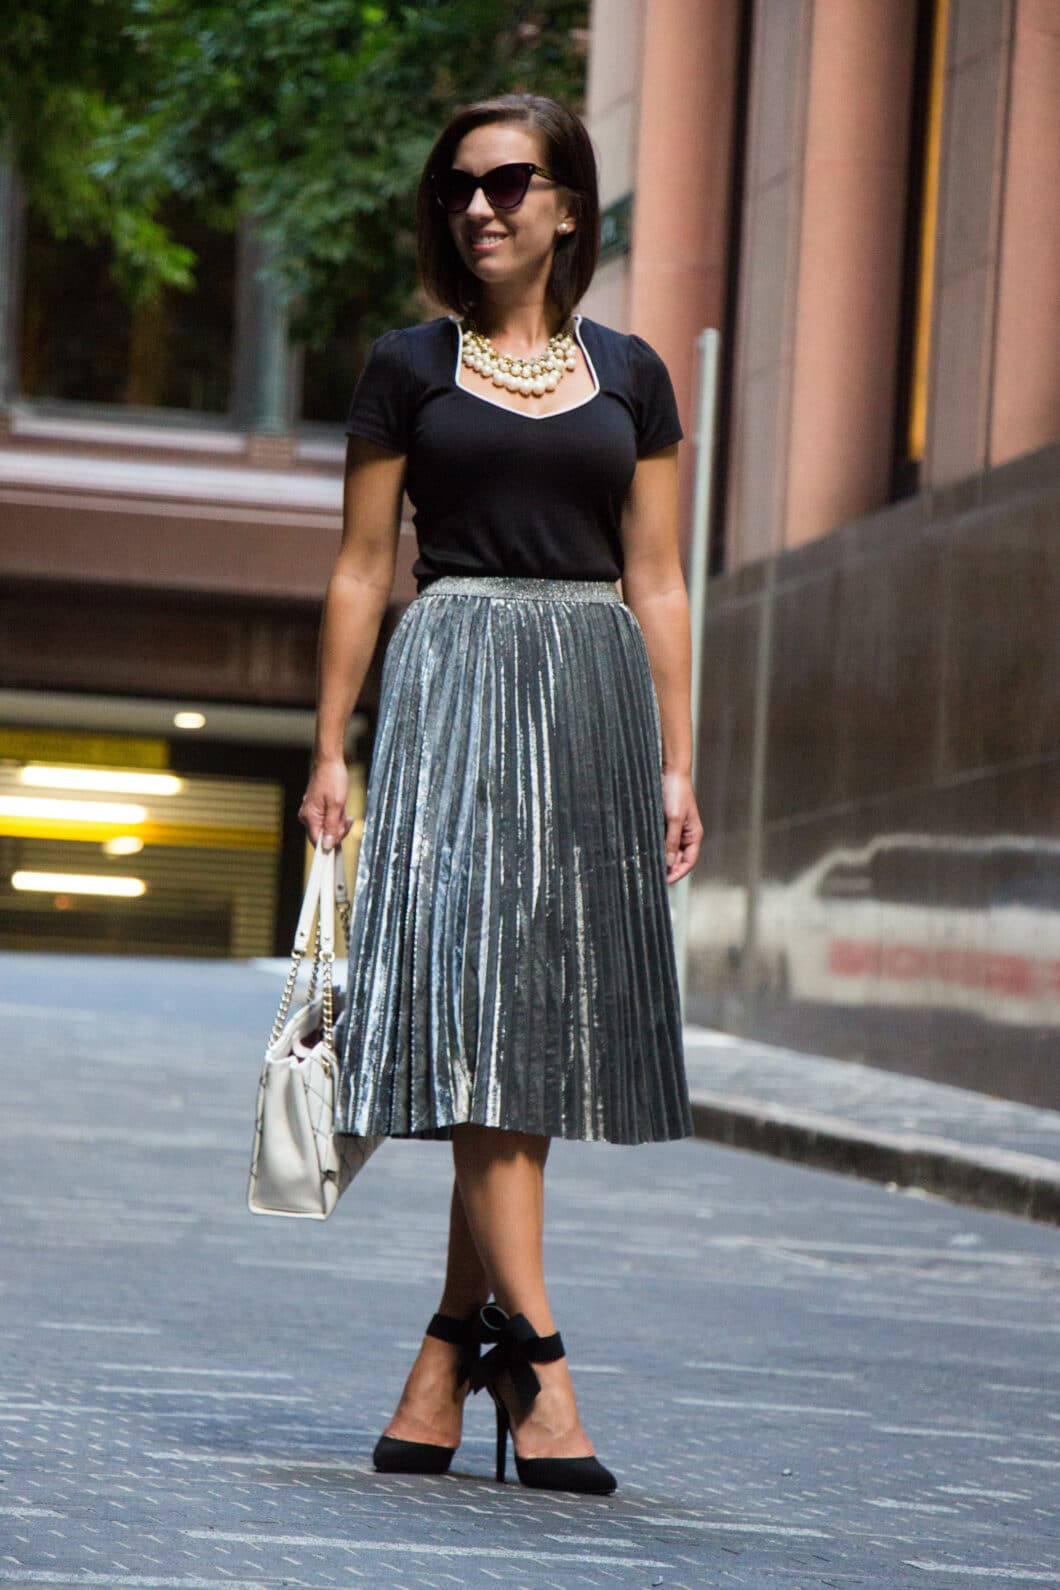 Pearls, Bows & Metallic Skirts